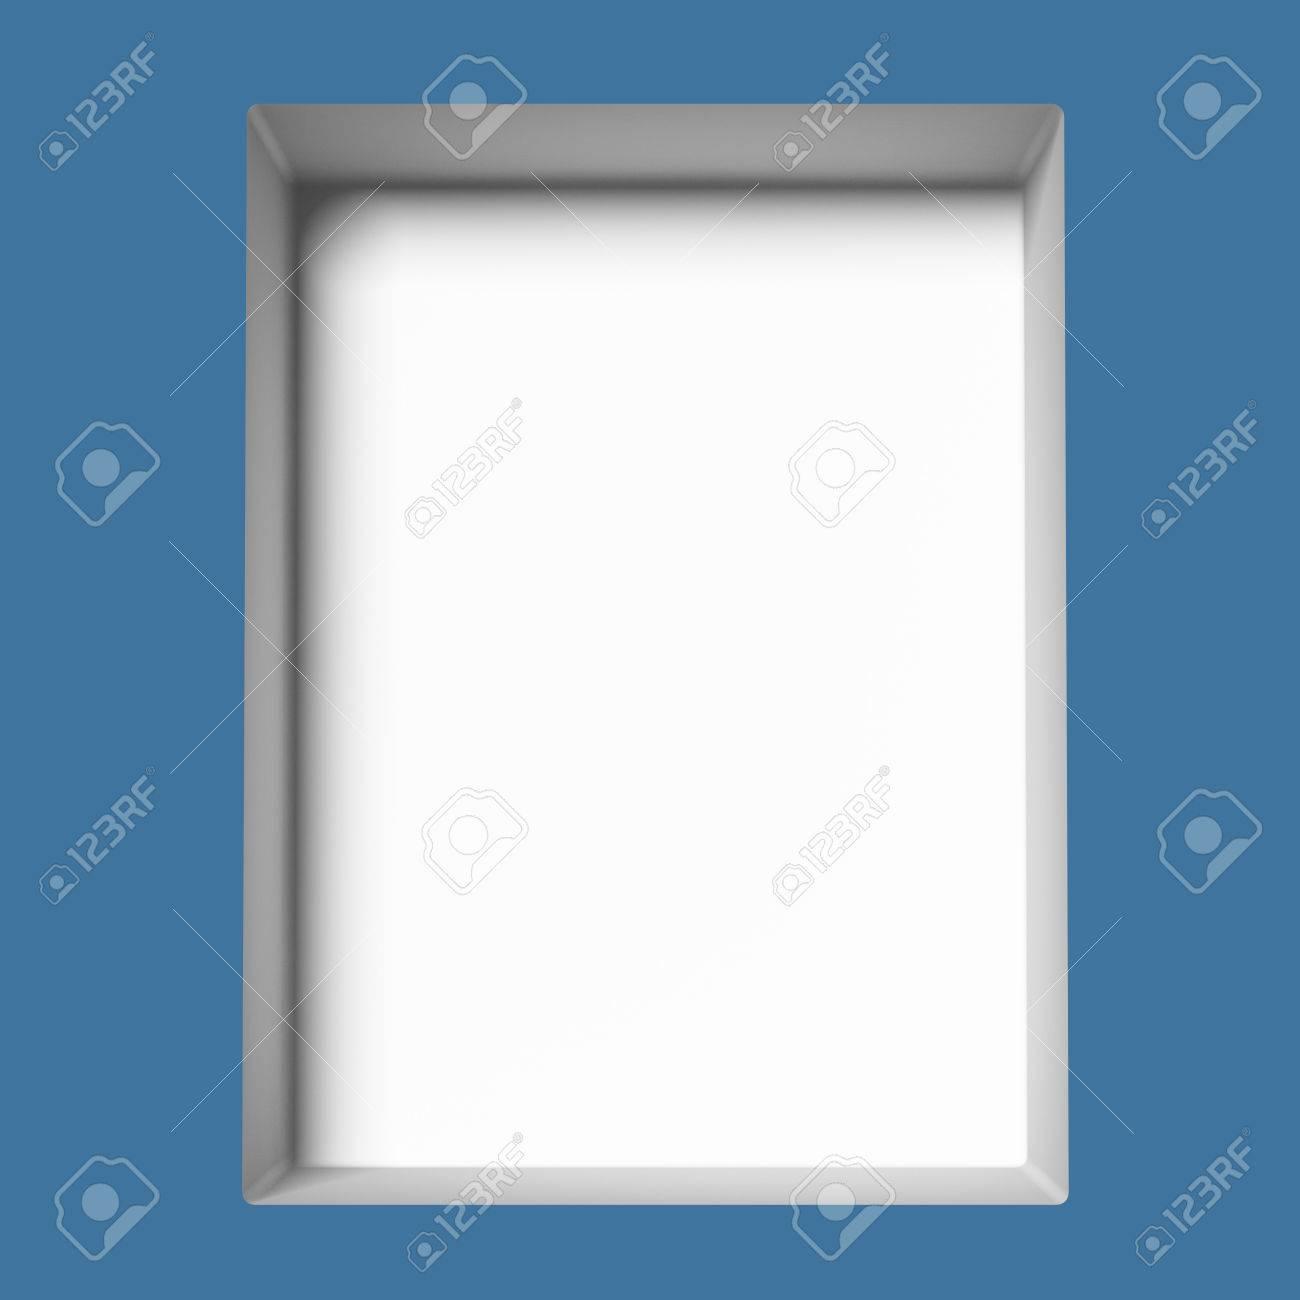 single blue empty showcase. 3d render Stock Photo - 22403619